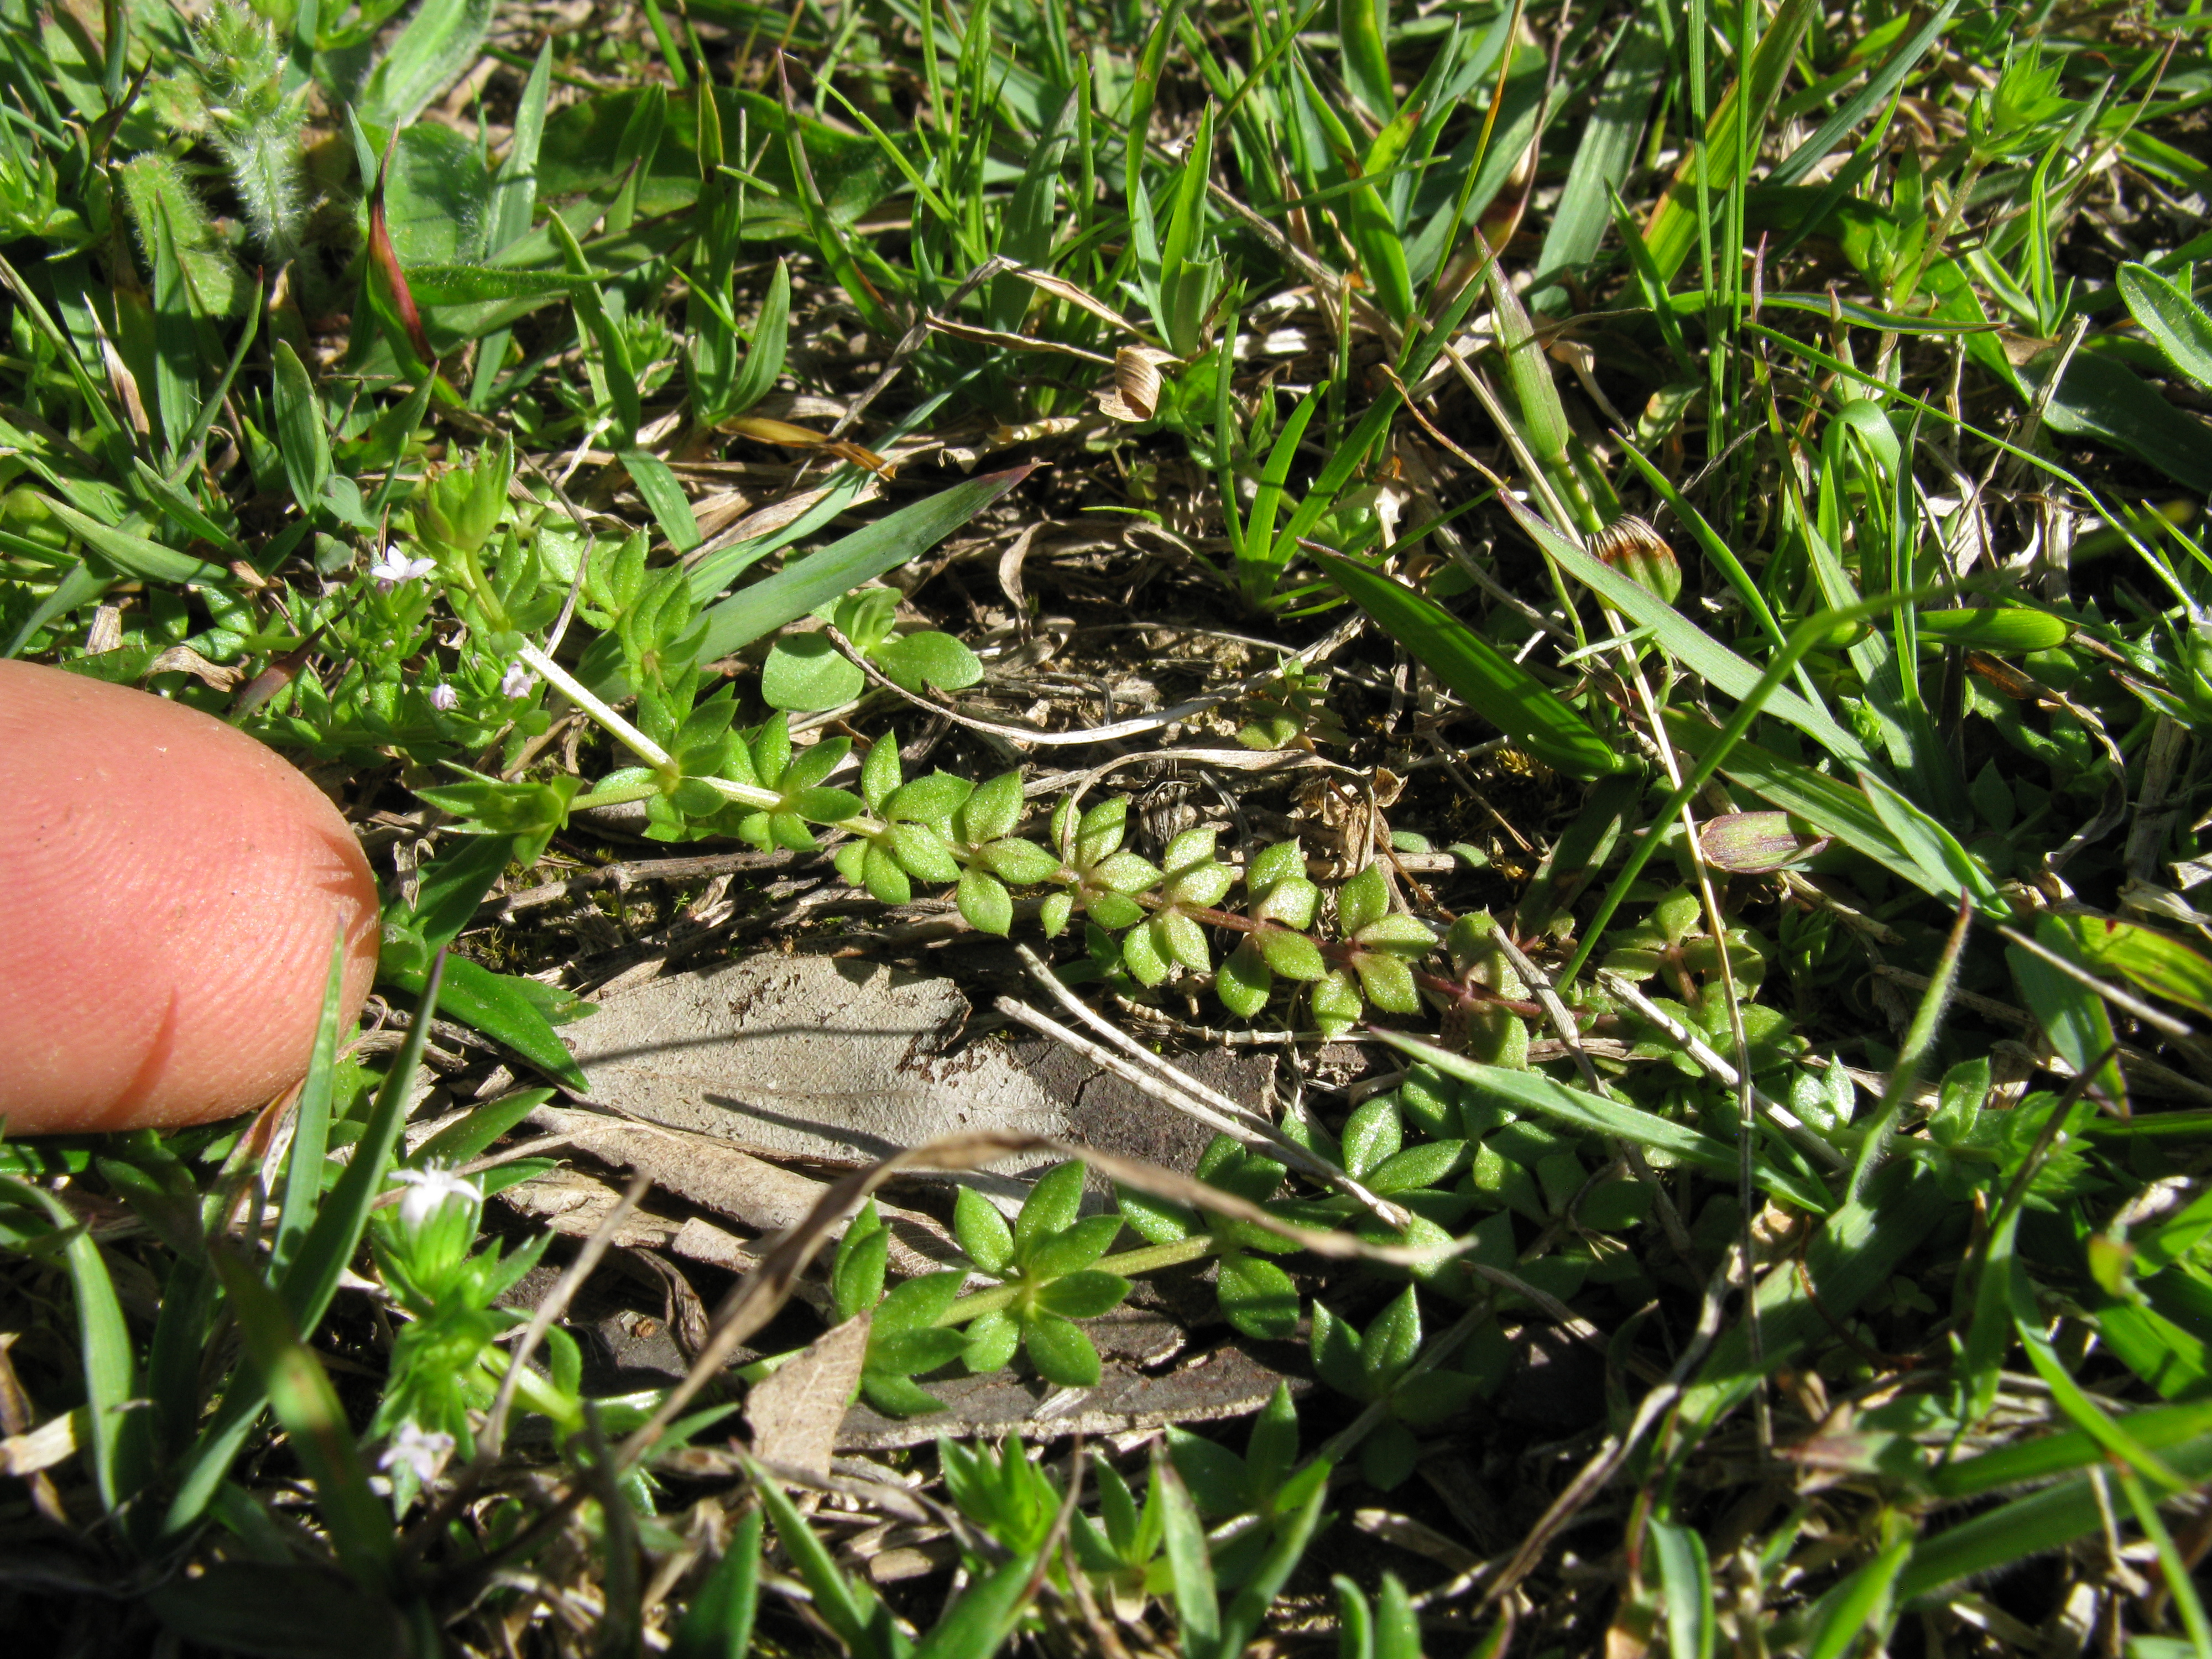 file sherardia arvensis plant1 dc flickr macleay grass man jpg